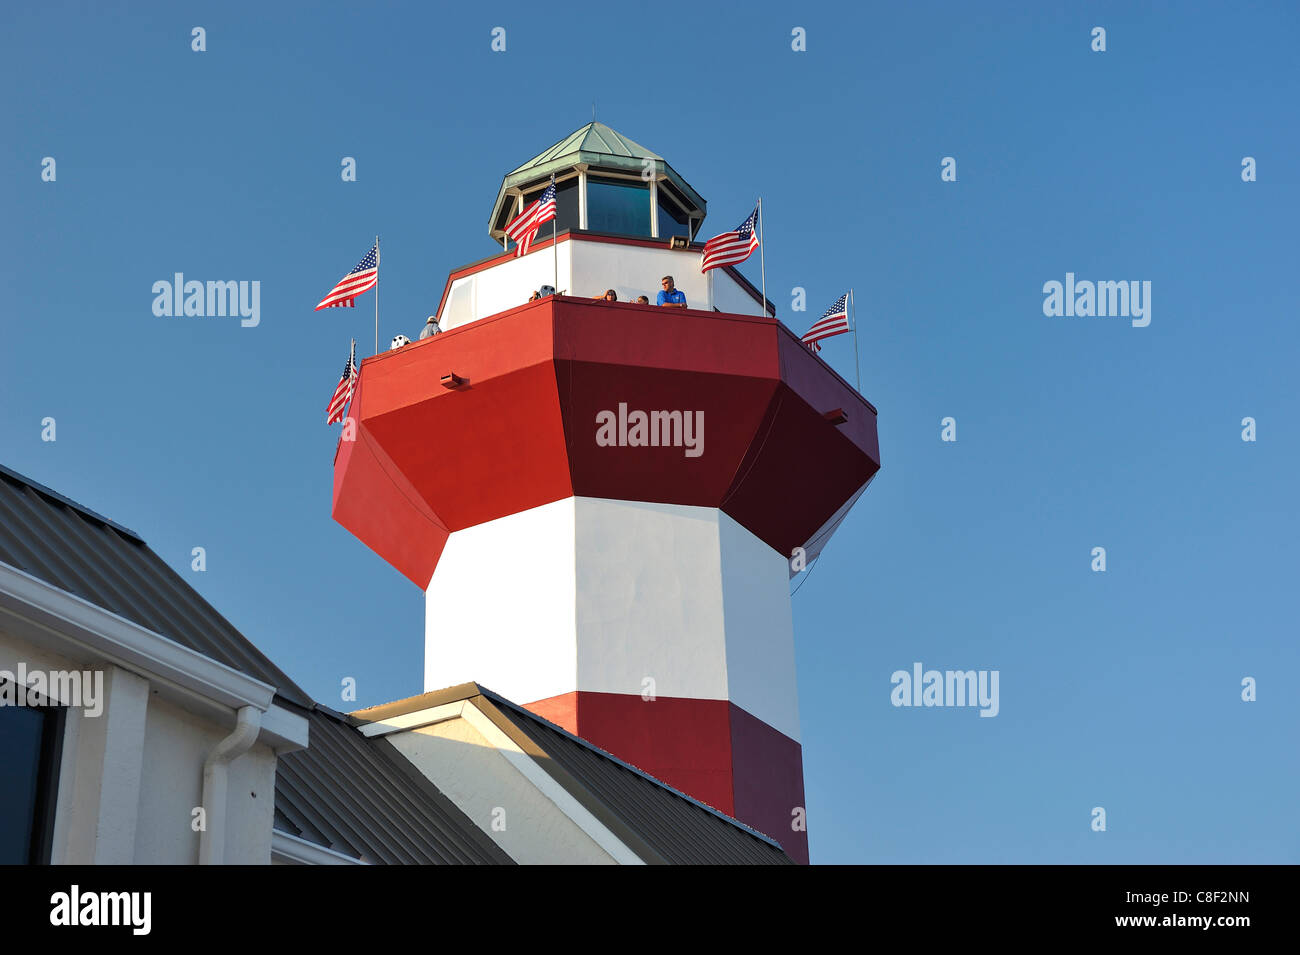 Lighthouse, Harbour Town, Sea Pines Plantation, Hilton Head Island, South Carolina, USA, United States, America, - Stock Image